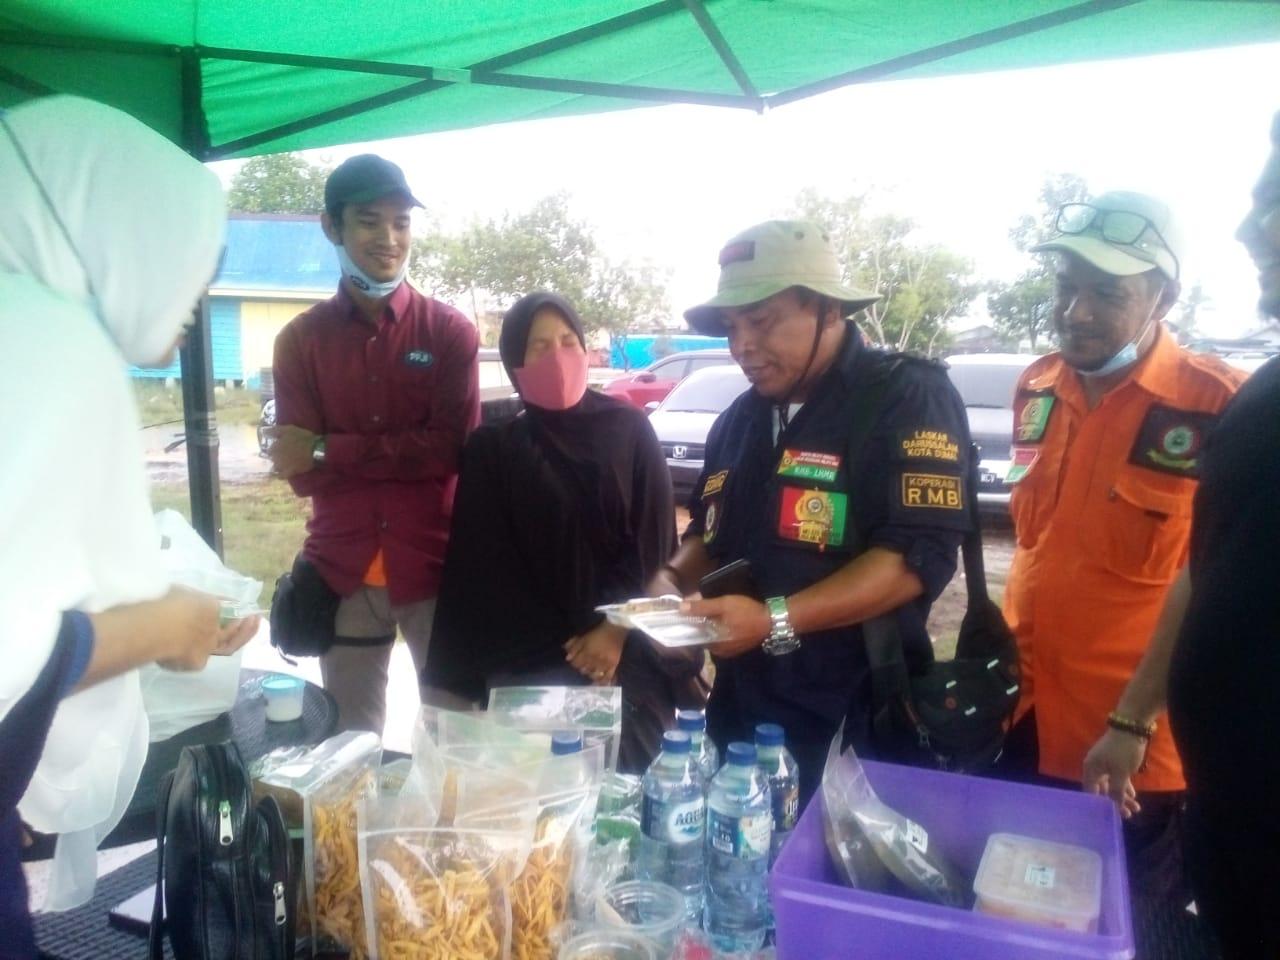 Panglimo RMB-LHMR Haji Awaluddin Beri Apresiasi Pada Bazar UMKM Oleh DPC PPJI Kota Dumai